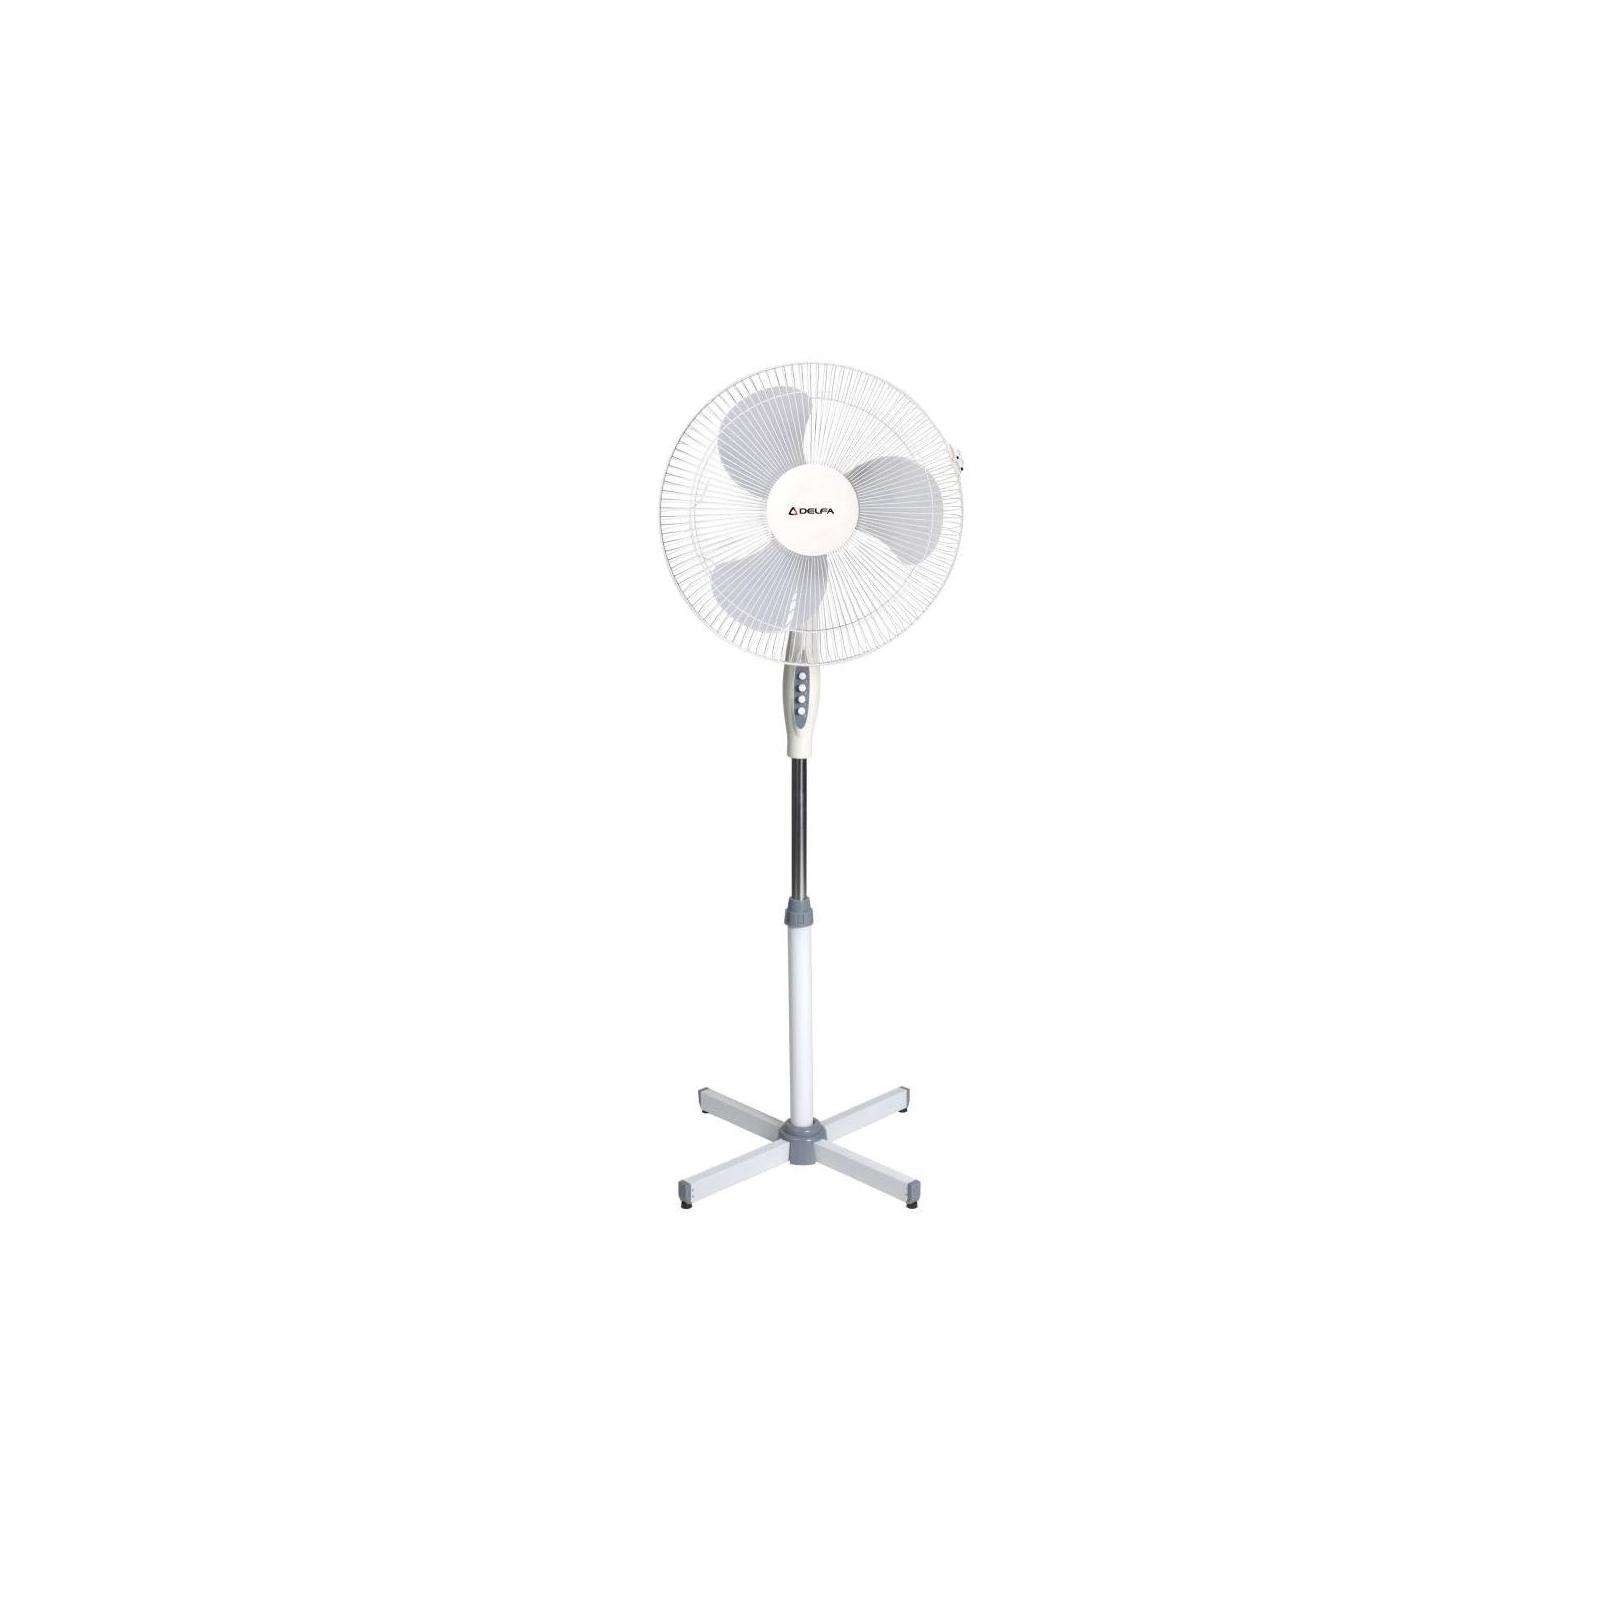 Вентилятор Delfa DSF-1601